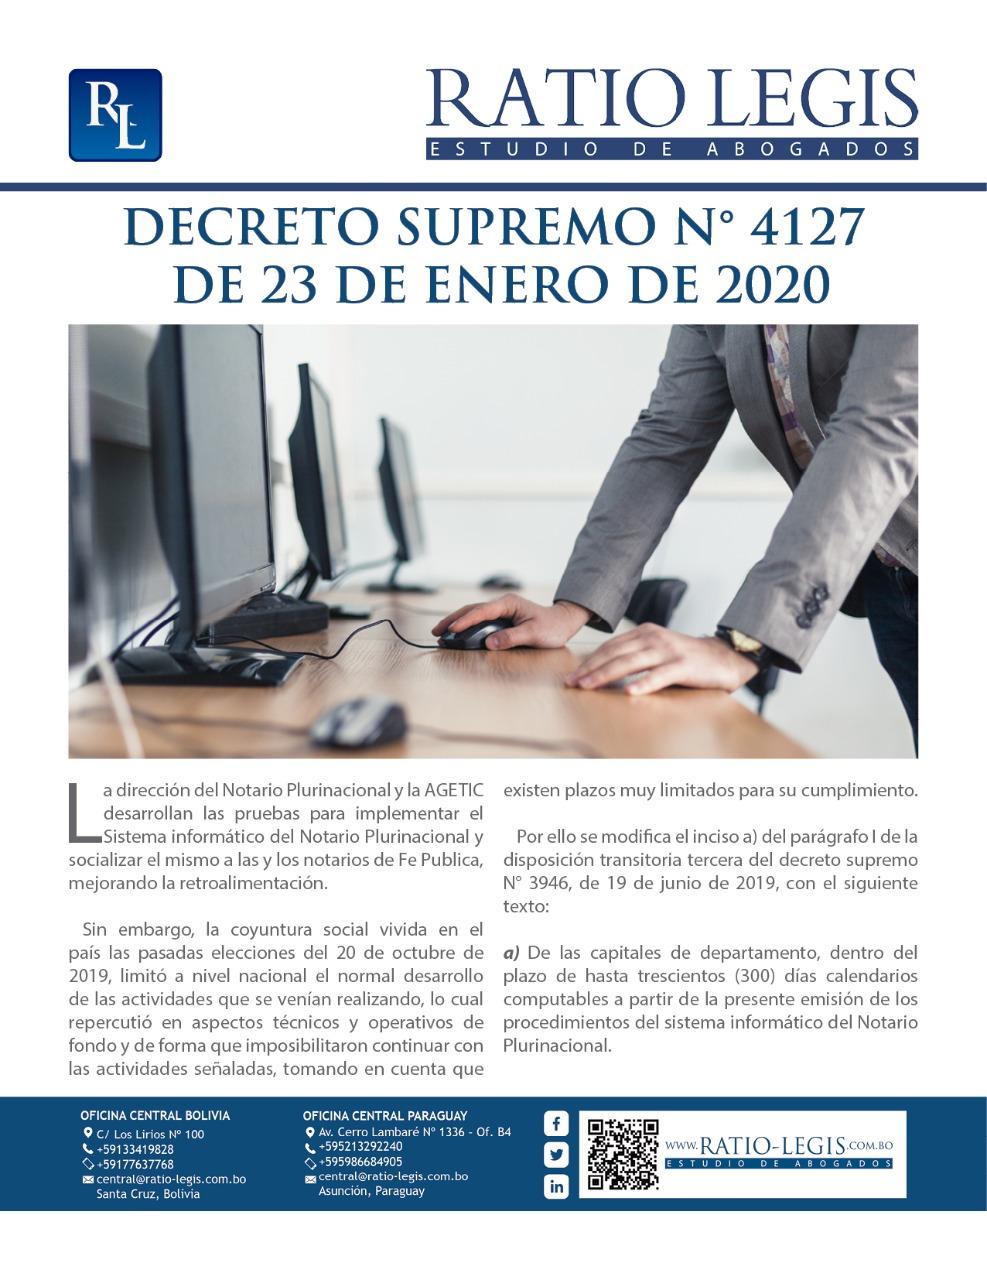 (Español) Decreto Supremo Nº 4127 de 23 de Enero de 2020